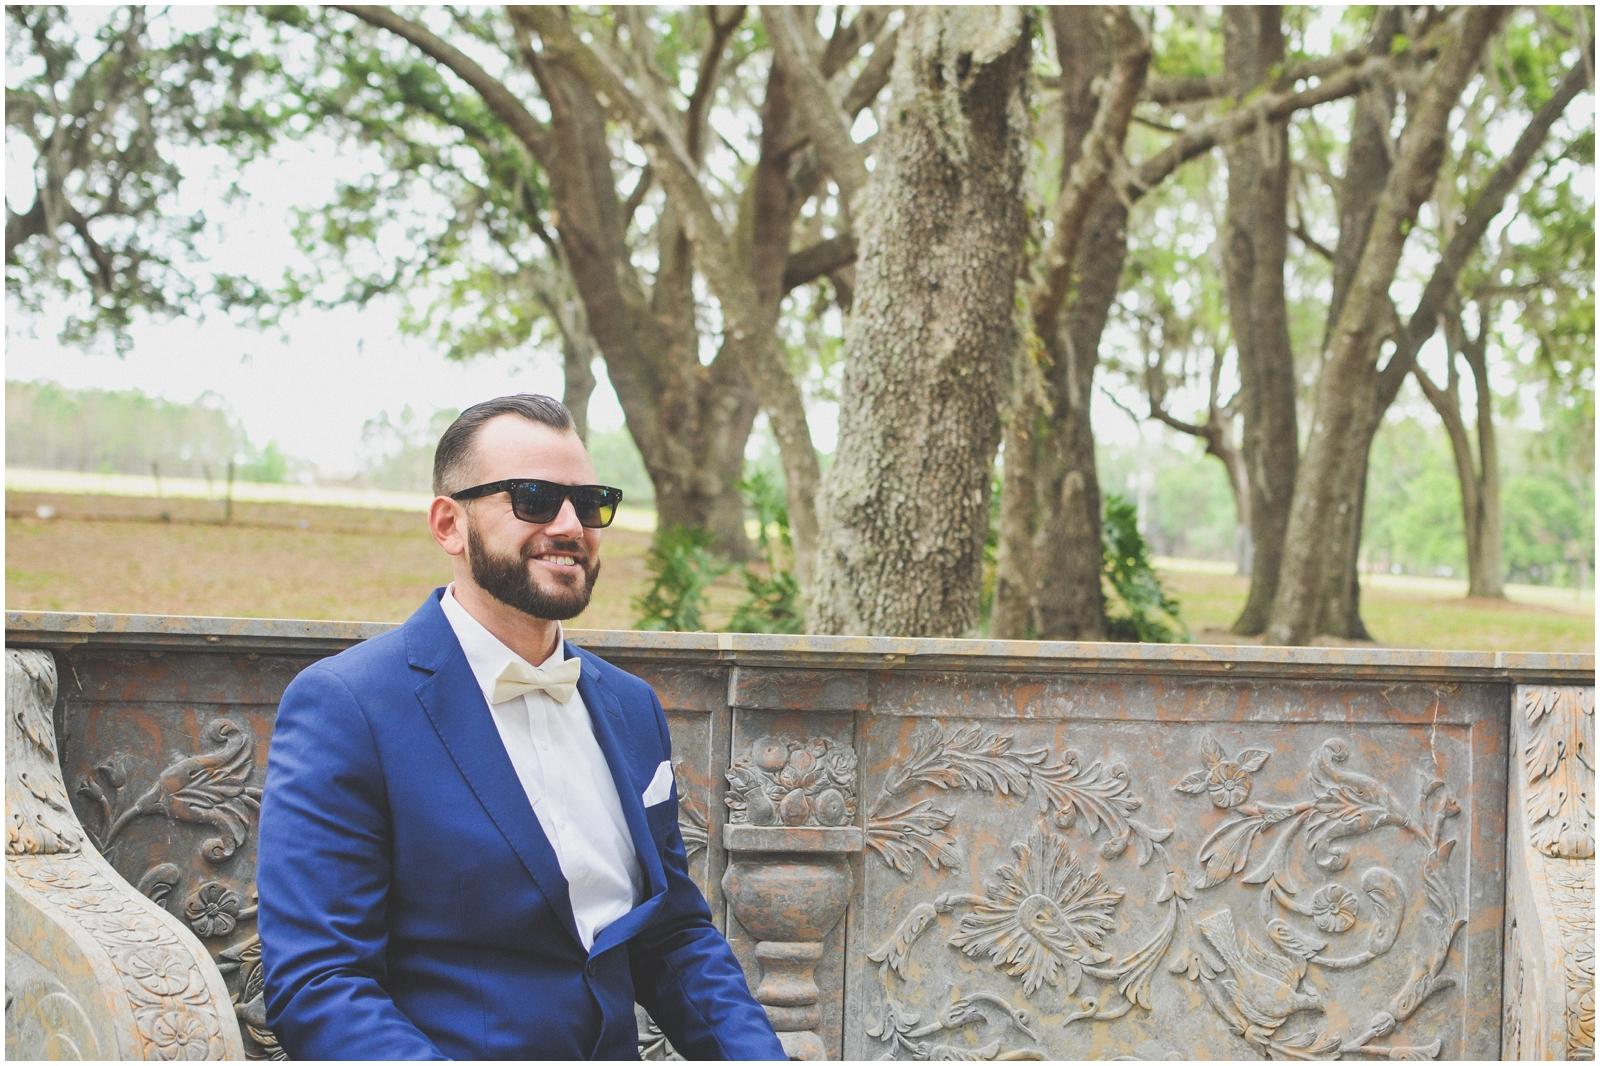 Rustic-Elegant-Wedding-Venue-in-Tampa-Stonebridge-Events_0421.jpg